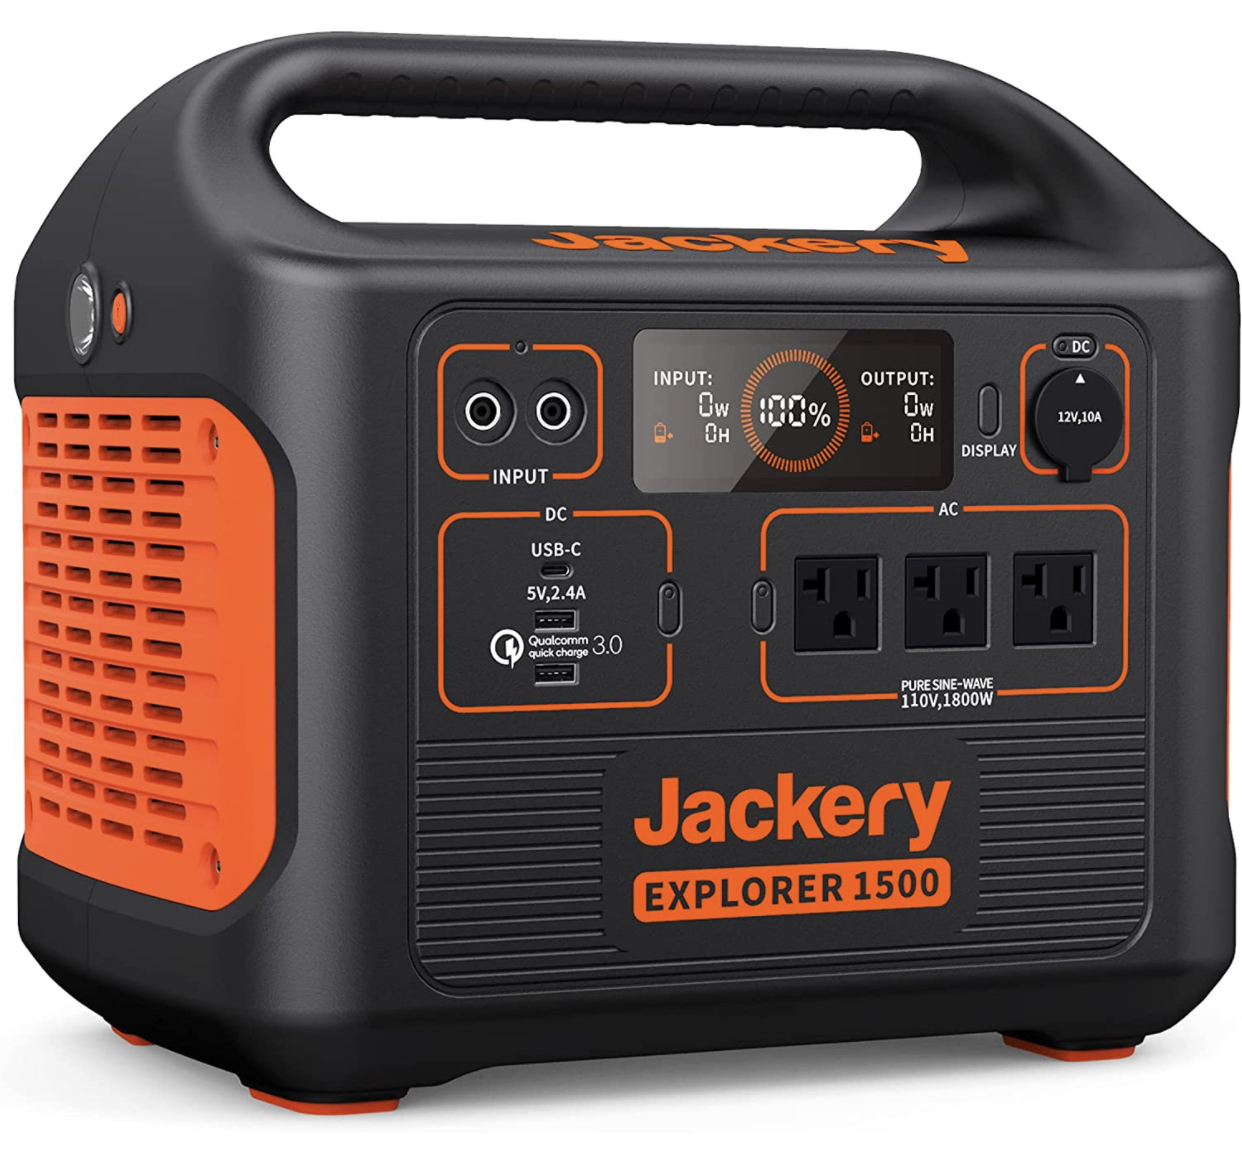 A display of the Jackery Explorer 1500 portable solar generator.